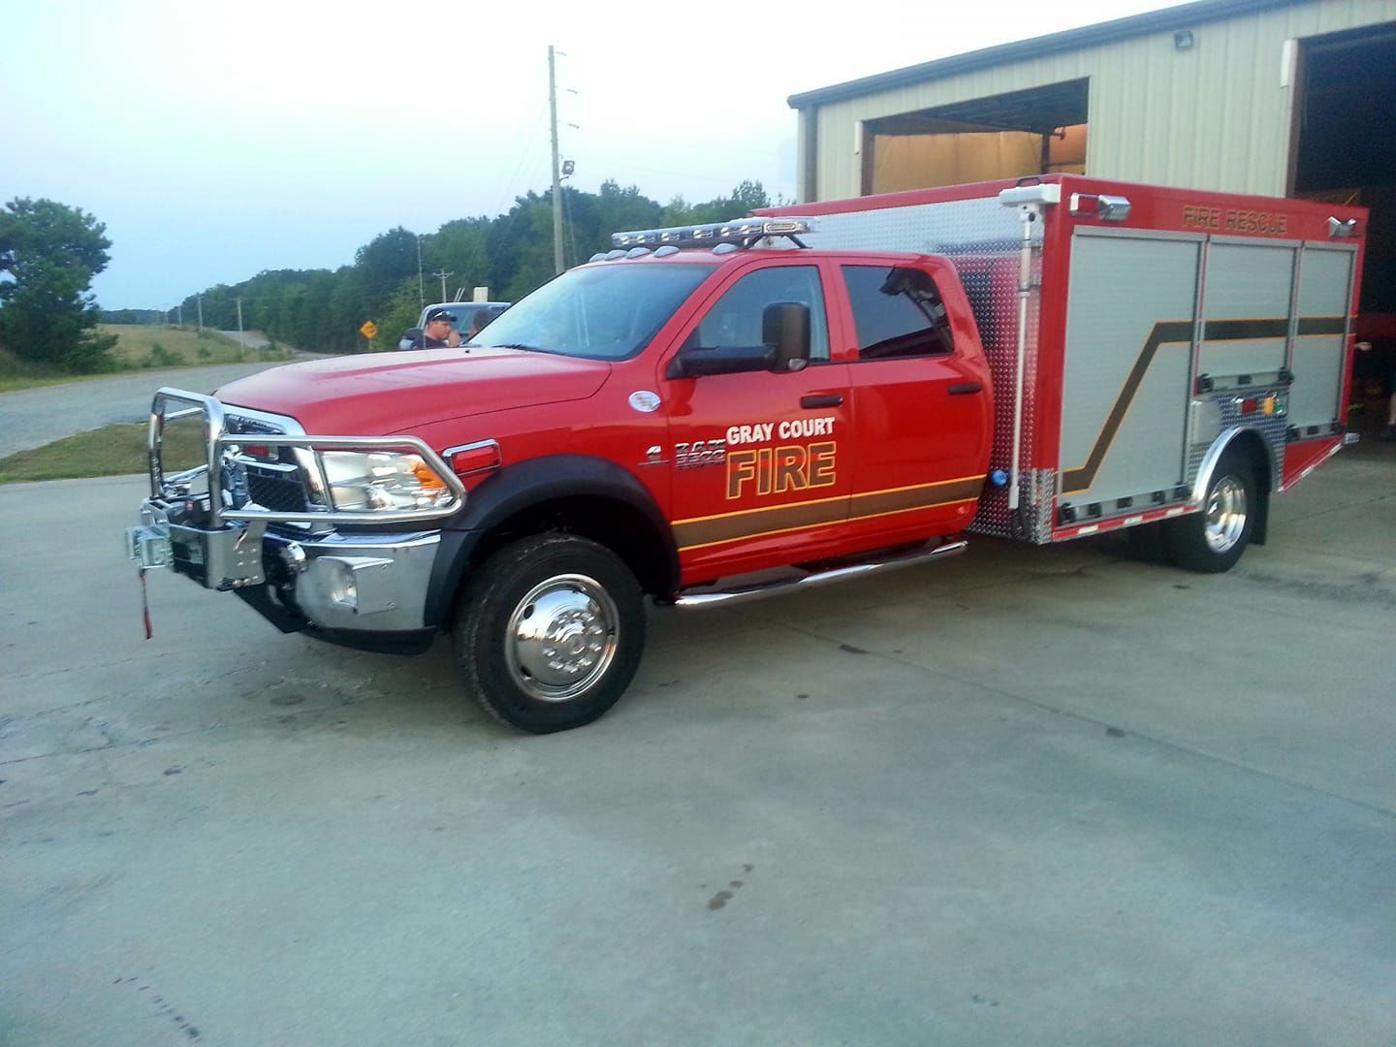 Gray Court Area Fire Department truck